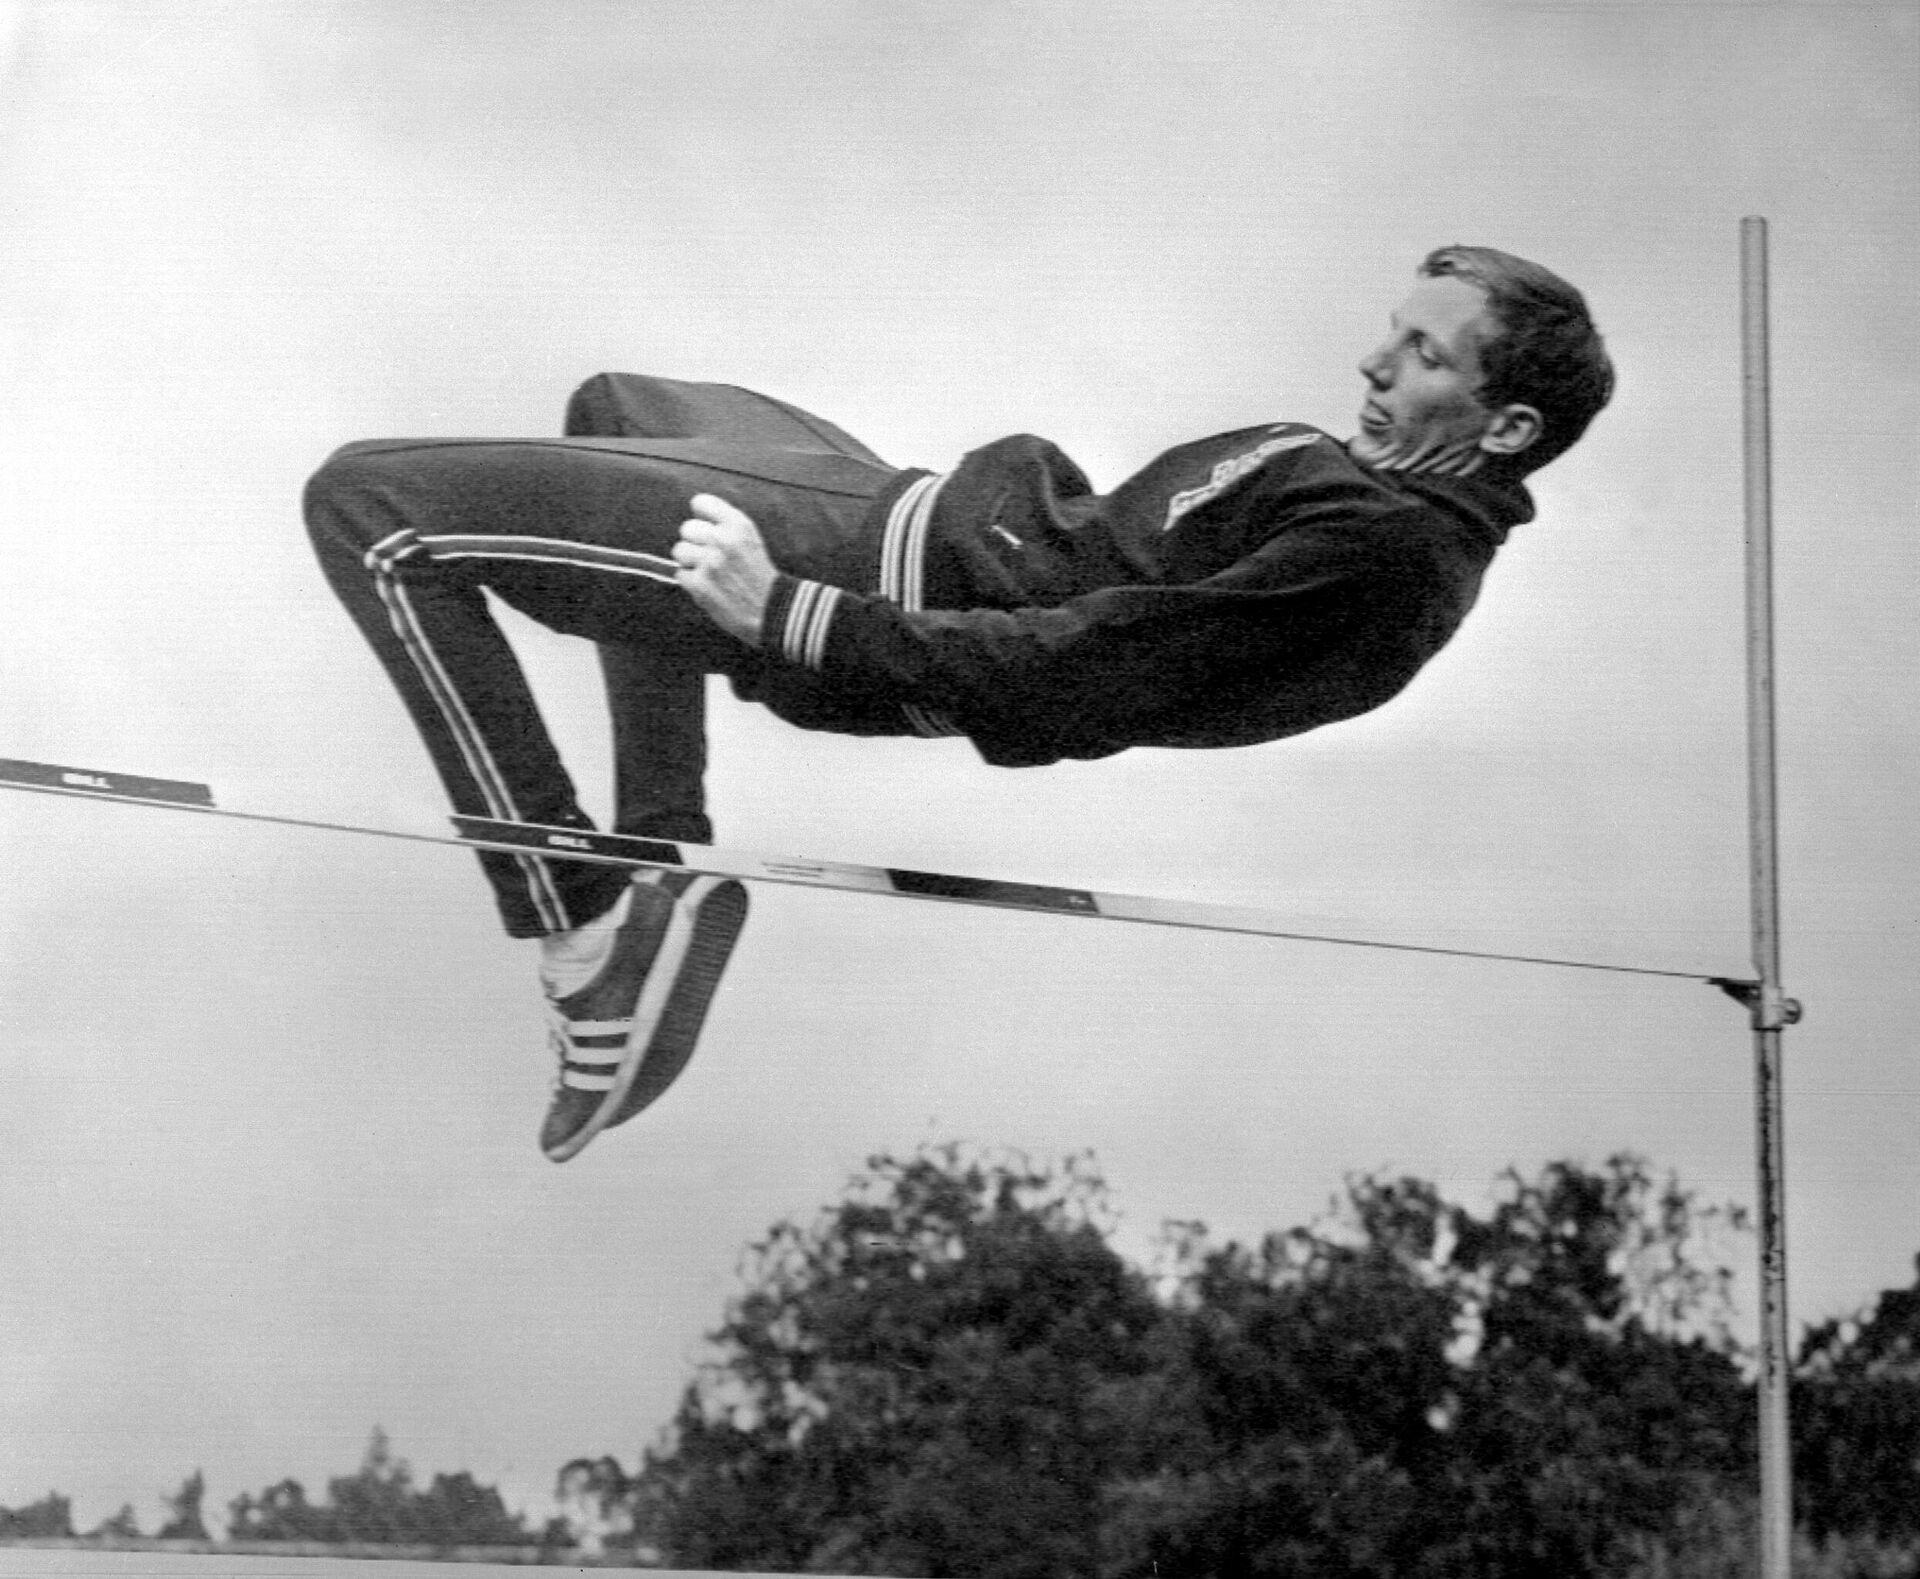 Дик Фосбери на Олимпийских играх 1968 года в Мексике - РИА Новости, 1920, 12.07.2021